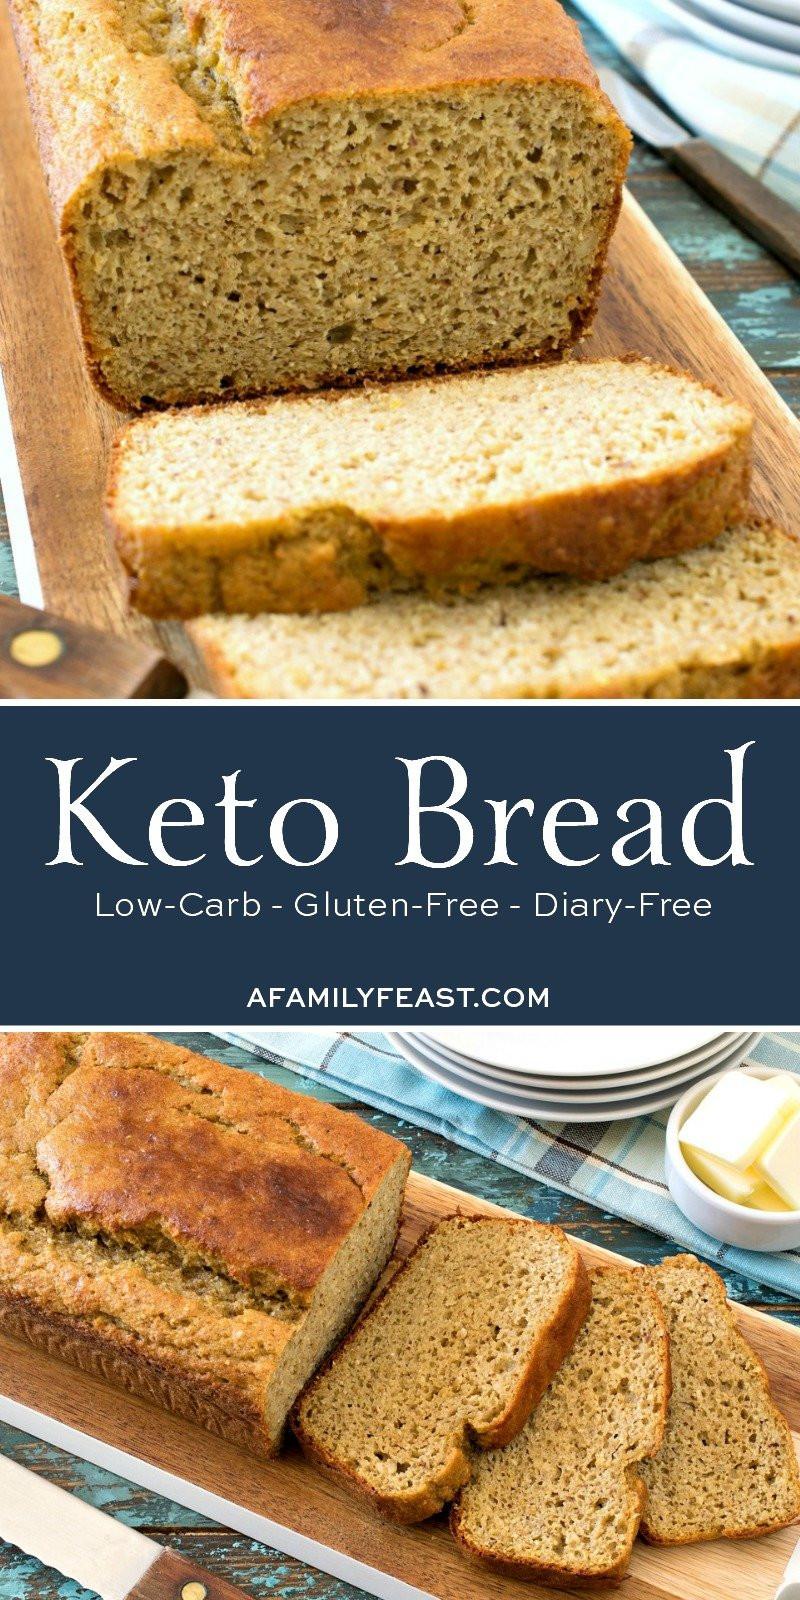 Keto Bread Whole Foods  Keto Bread A Family Feast